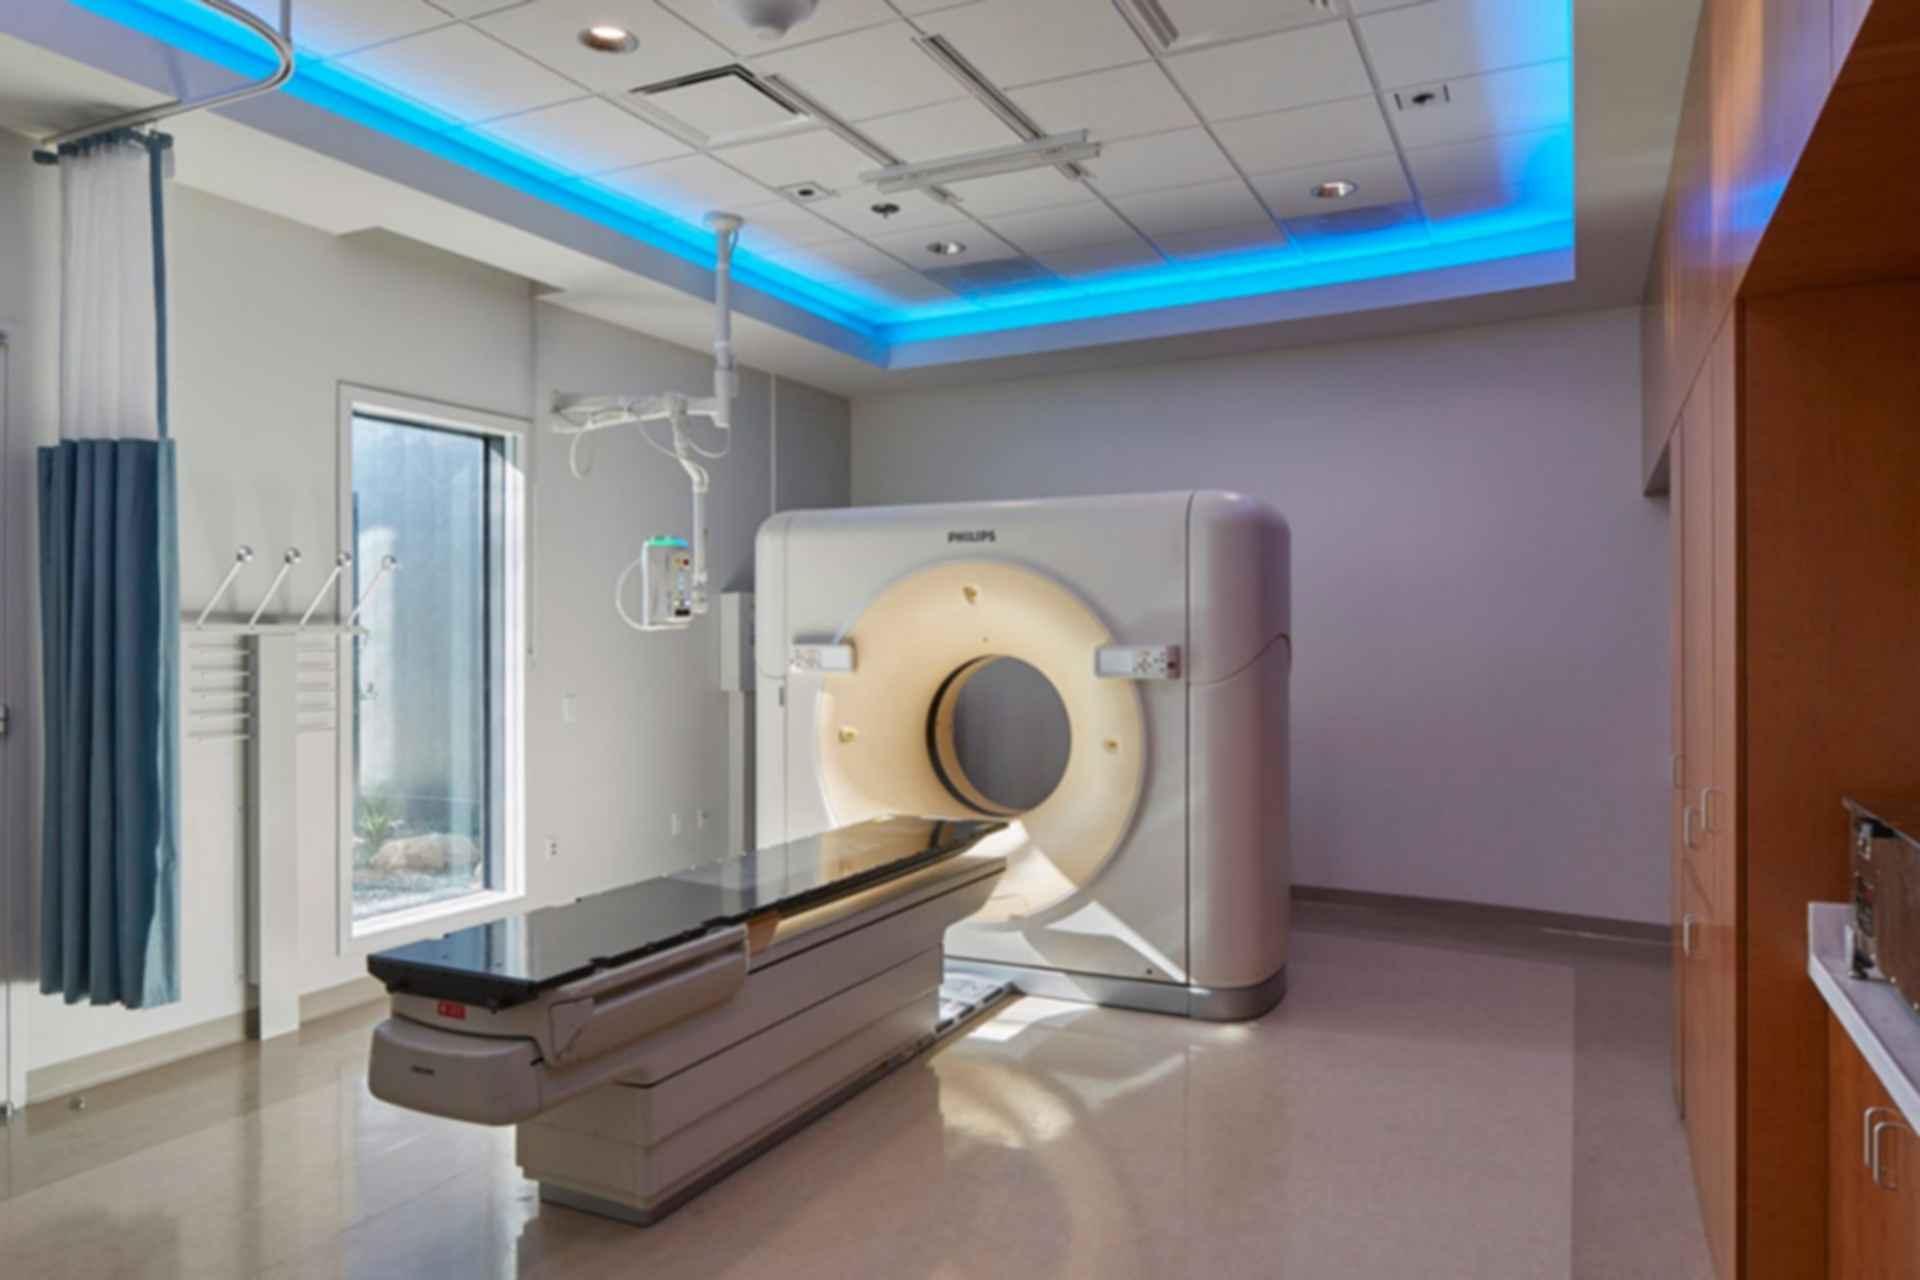 Kaiser Permanente Radiation Oncology Center - interior